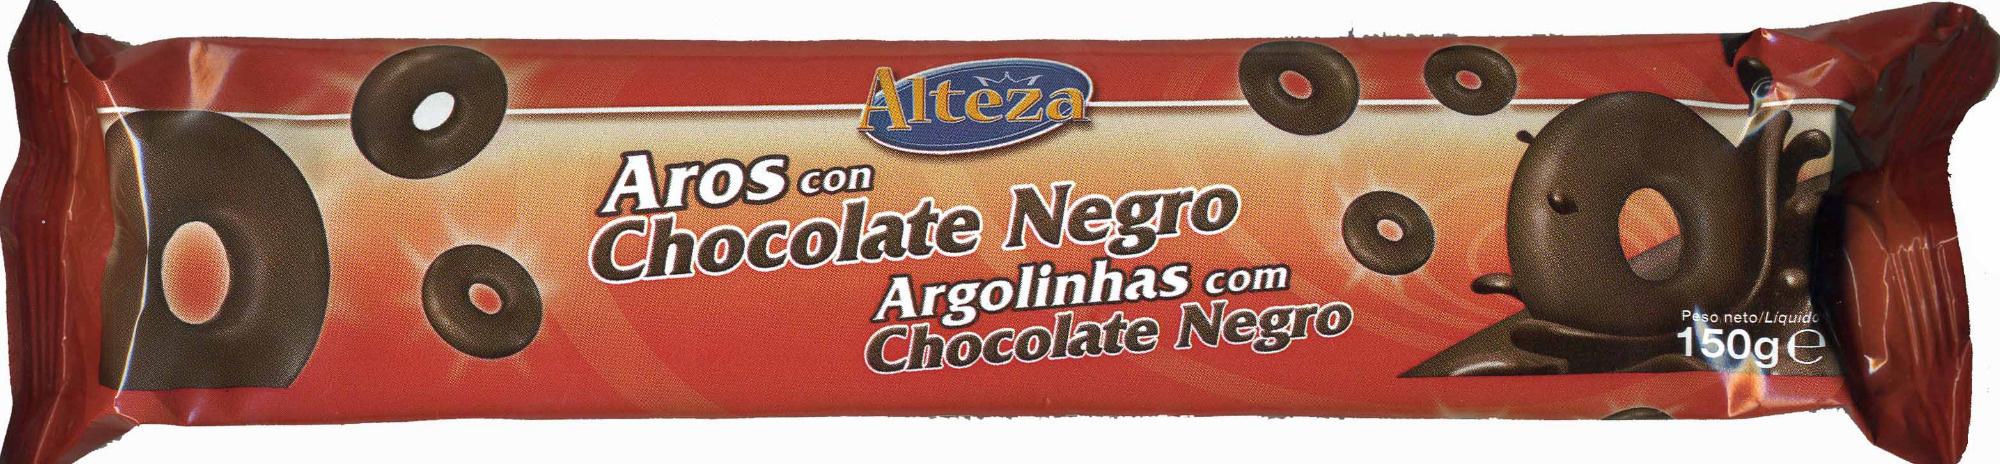 Aros de chocolate negro - Product